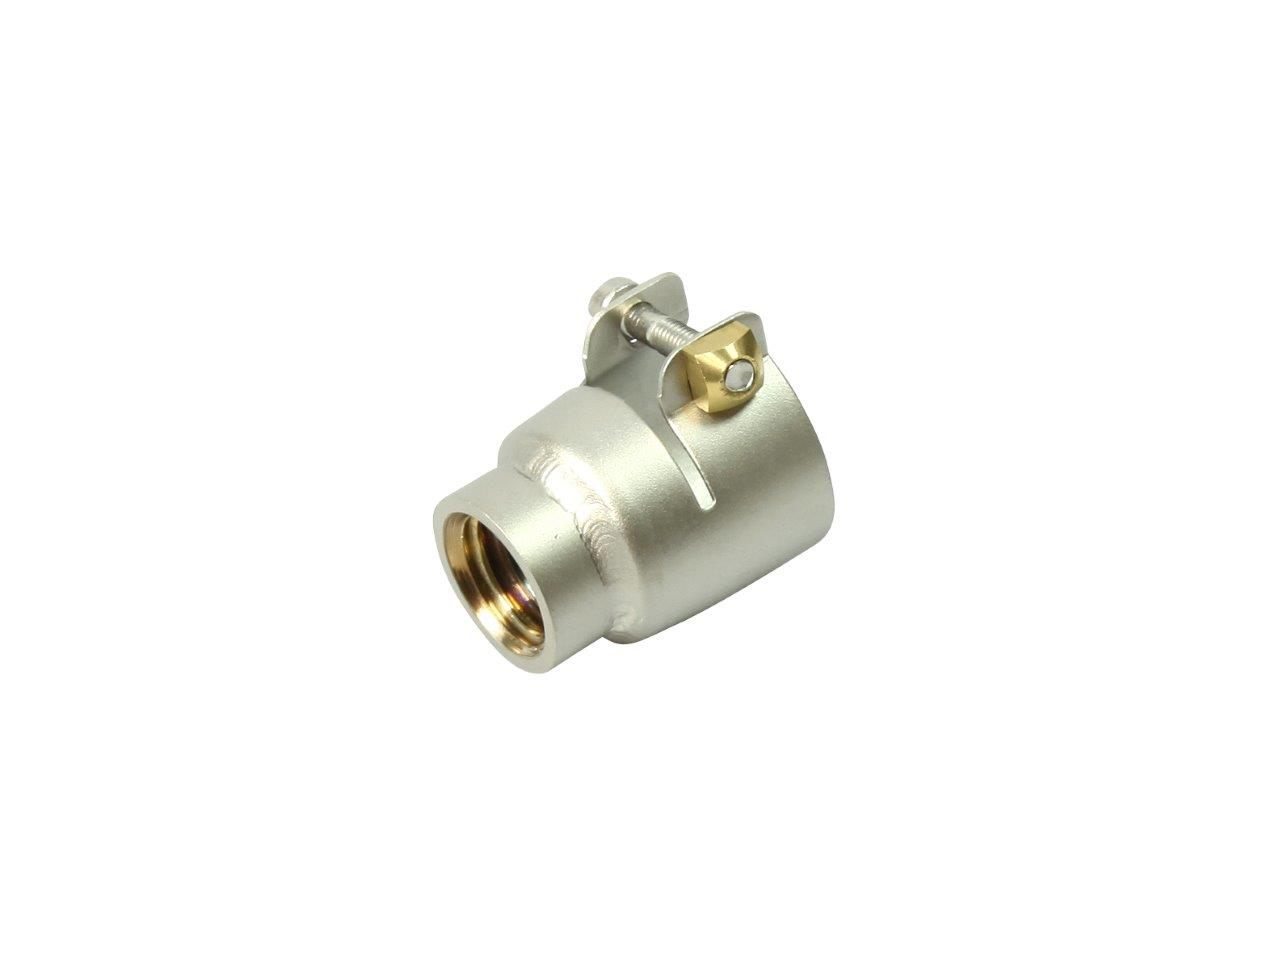 Leister Adapter Tbv schroefmondstukken Schuif 143.831